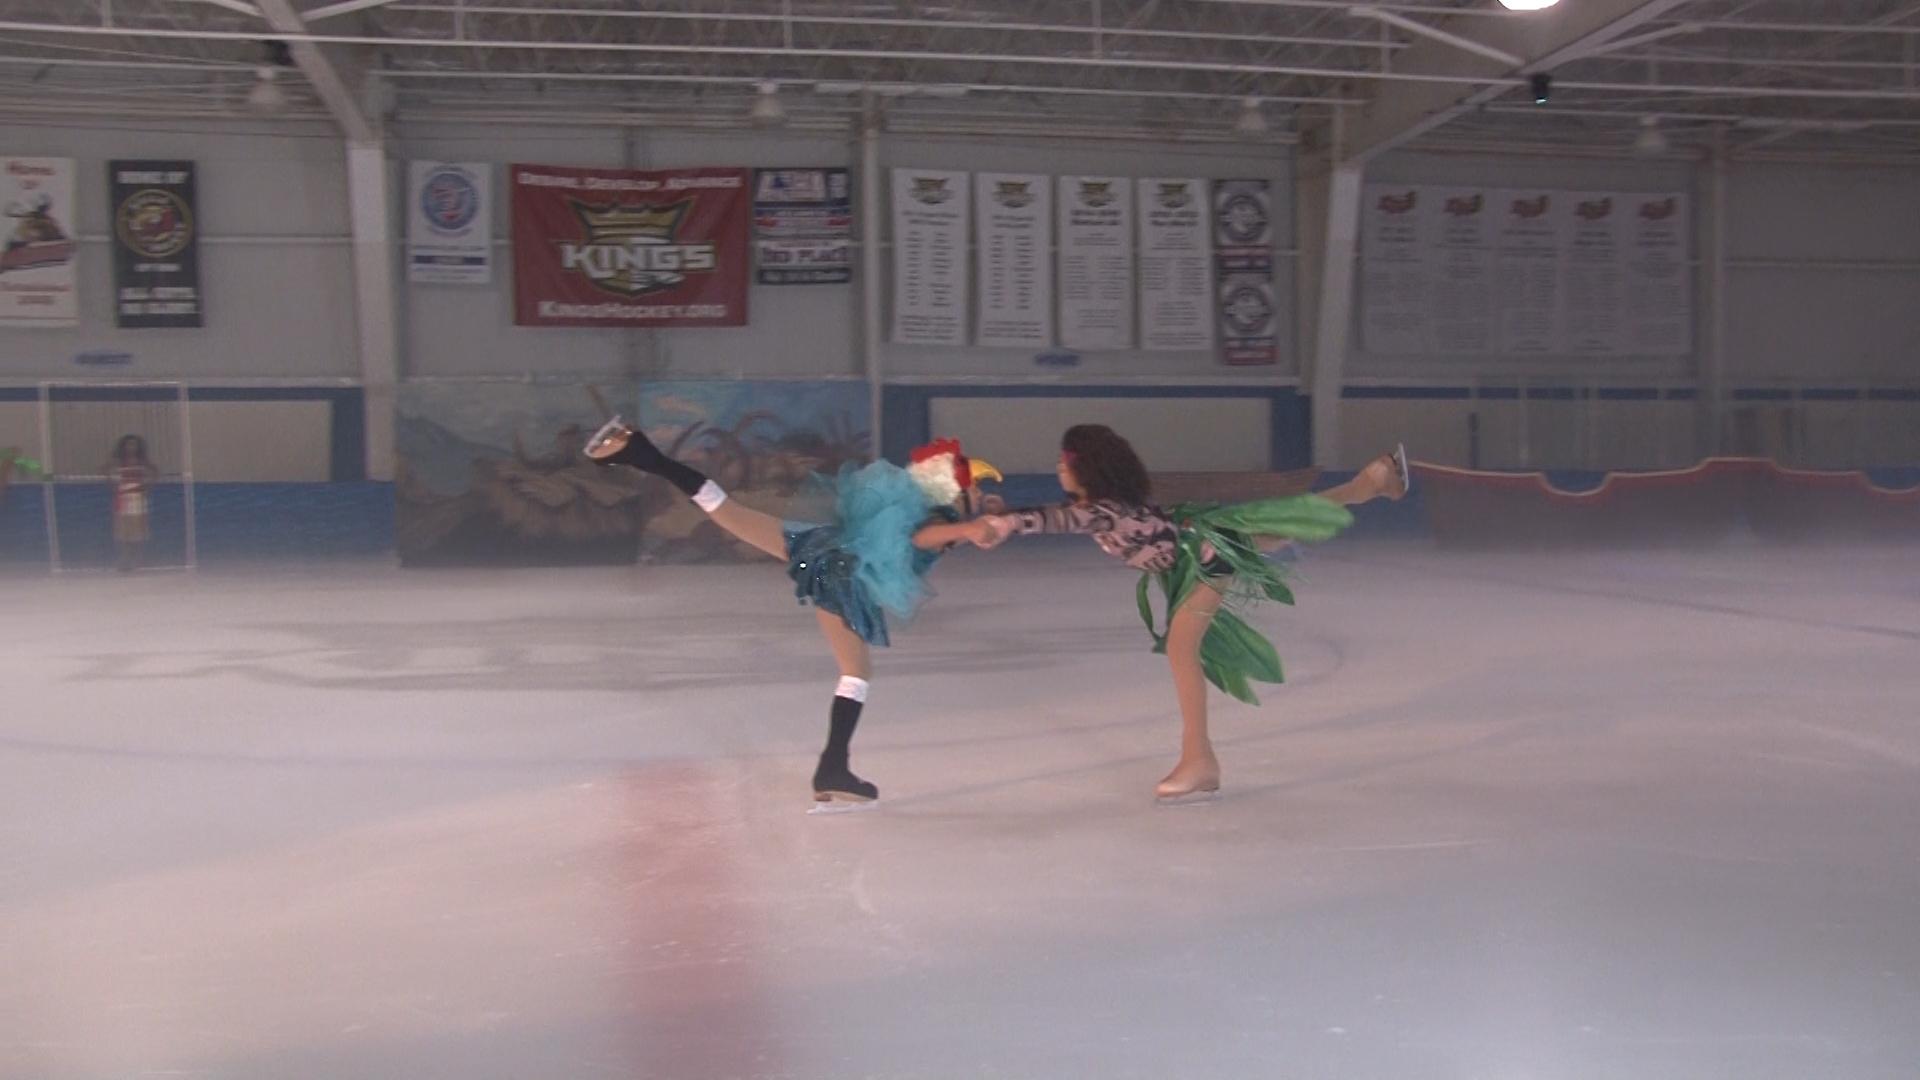 Power Play Maui Skate on Ice 071417.00_33_43_13.Still055.jpg